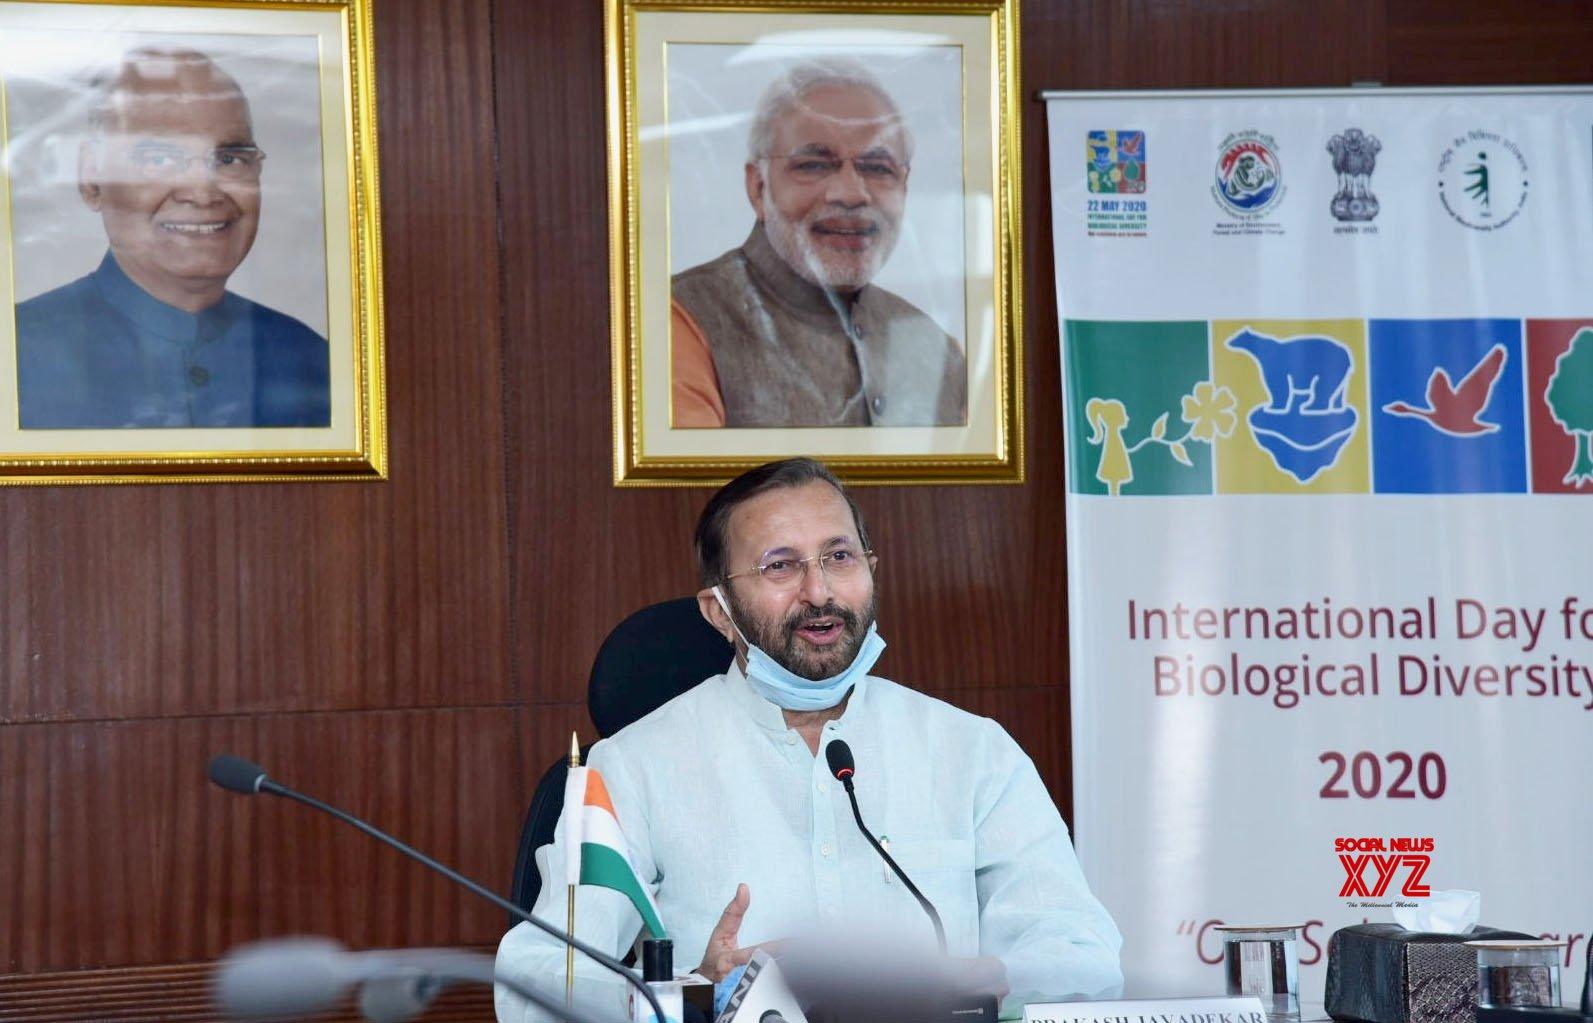 New Delhi: Prakash Javadekar addresses virtual celebration of the International Day for Biological Diversity 2020 #Gallery